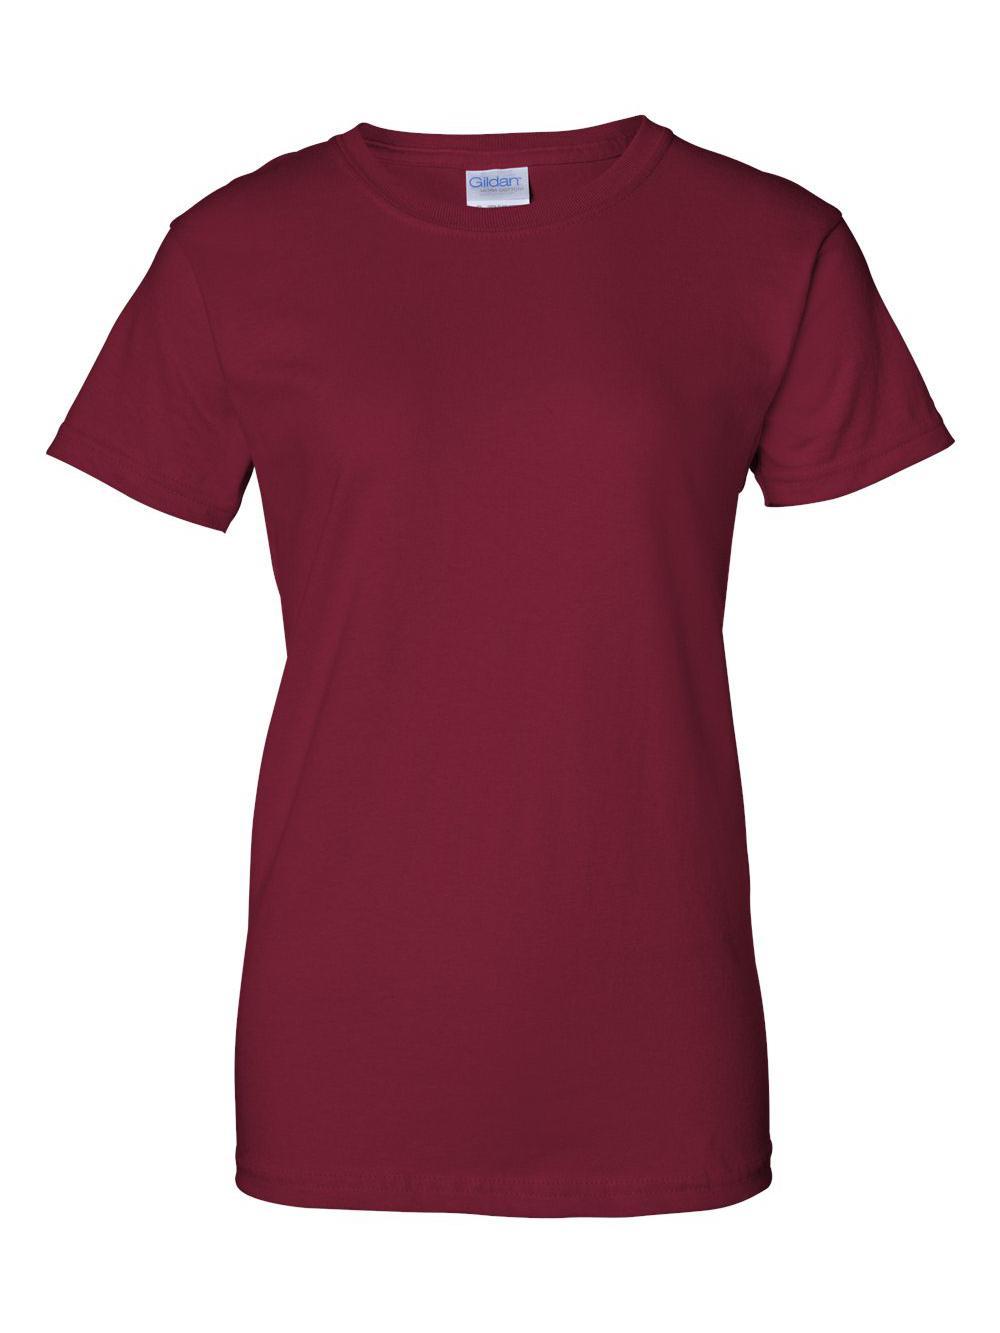 Gildan-Ultra-Cotton-Women-039-s-T-Shirt-2000L thumbnail 6